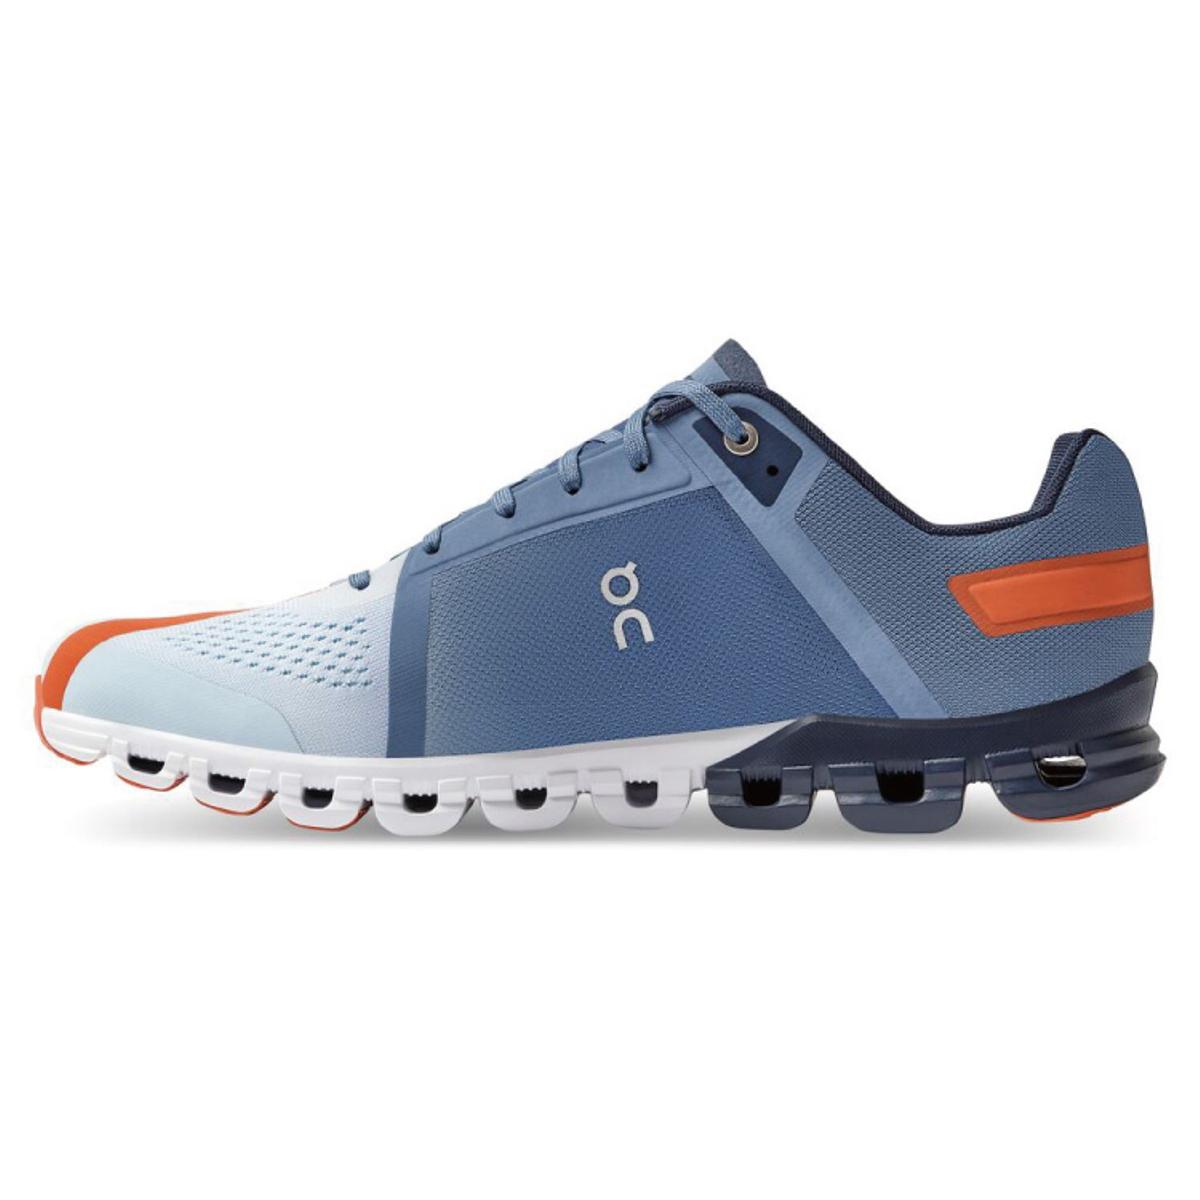 Men's On Cloudflow 3.0 Running Shoe - Color: Lake/Flare - Size: 7 - Width: Regular, Lake/Flare, large, image 2